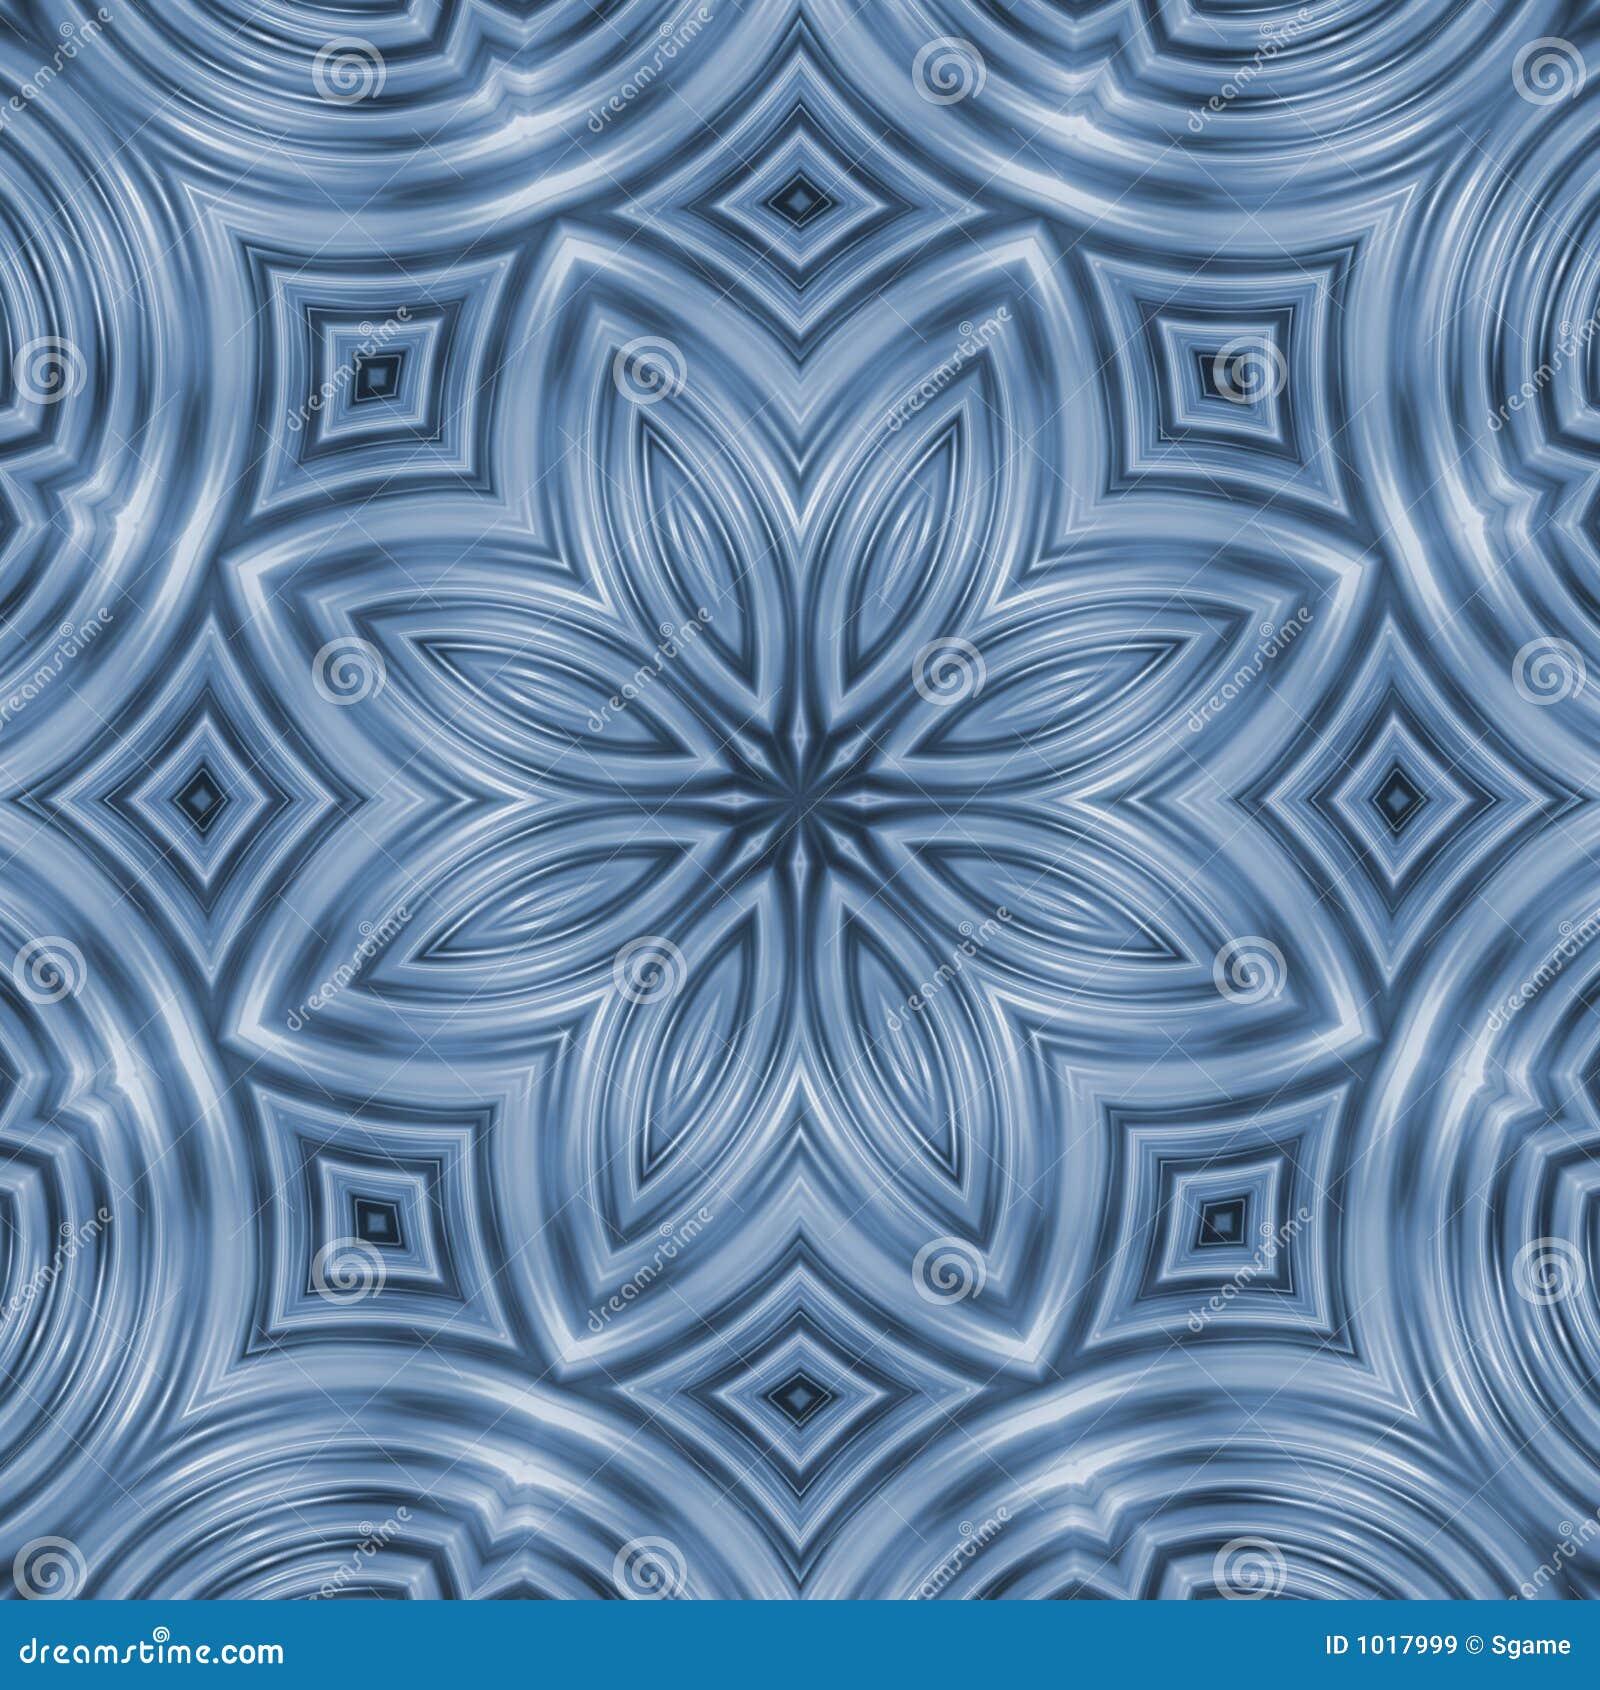 China Pattern Royalty Free Stock Images Image 1017999